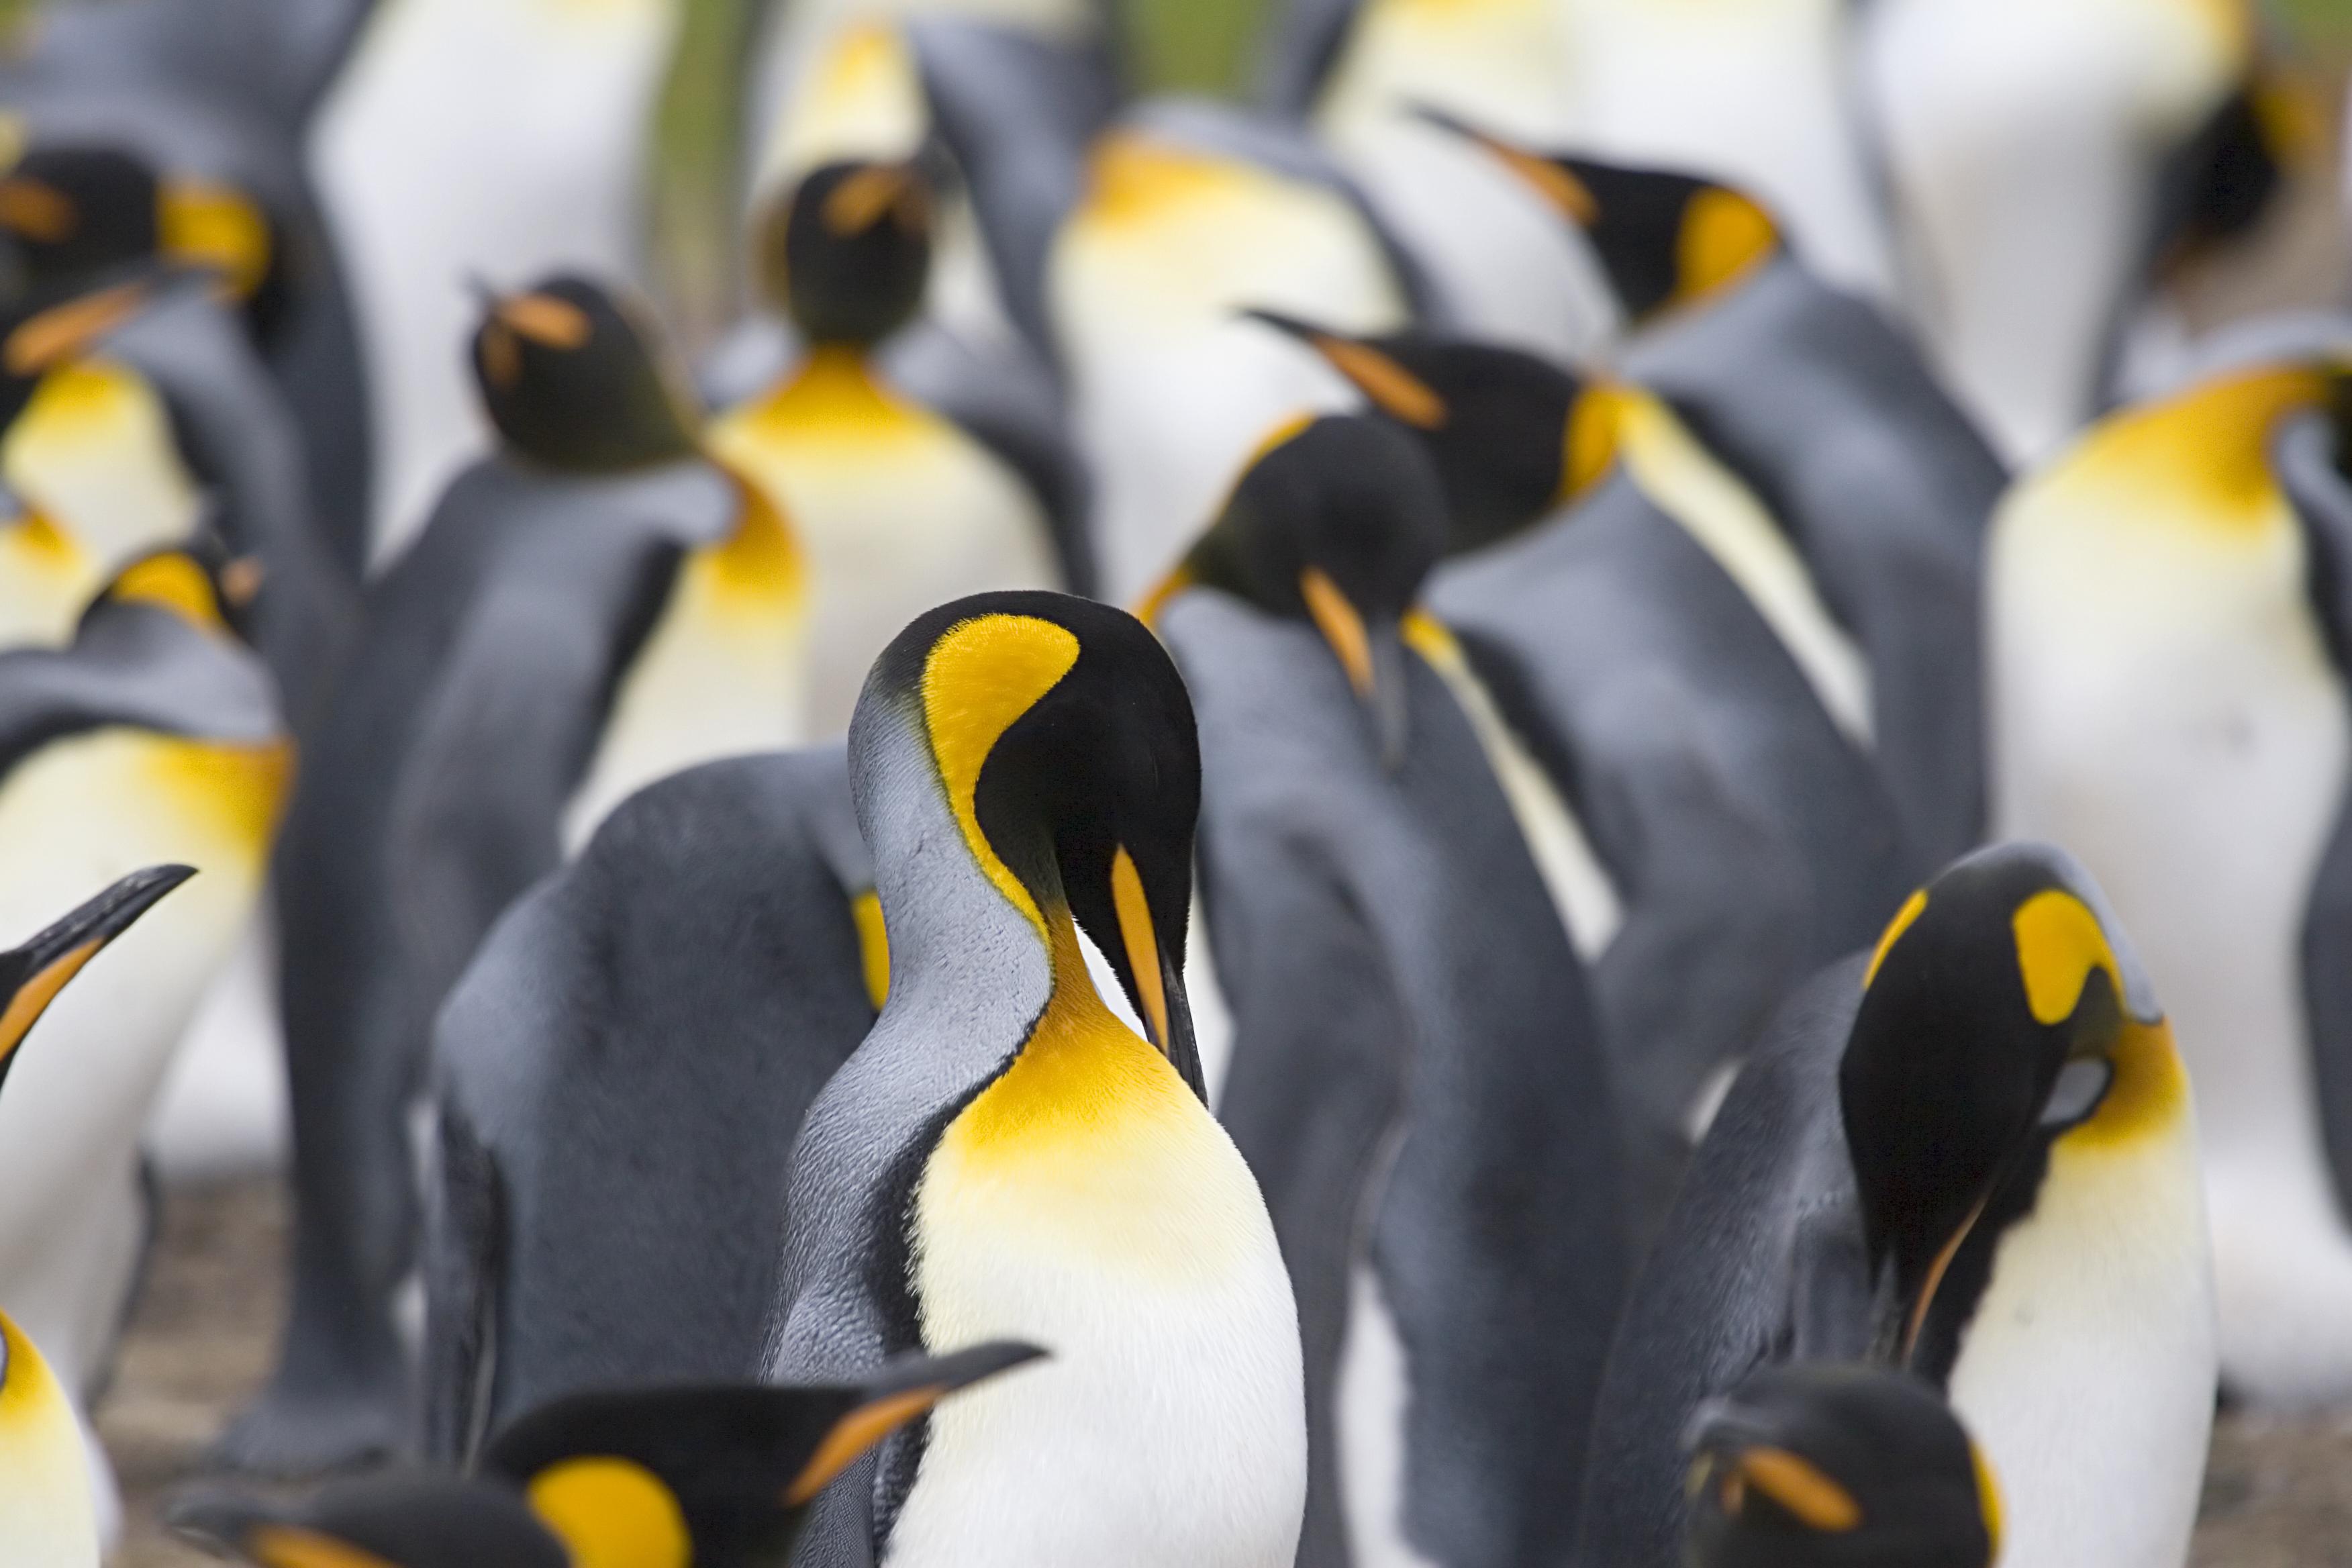 South Georgia has four penguin species